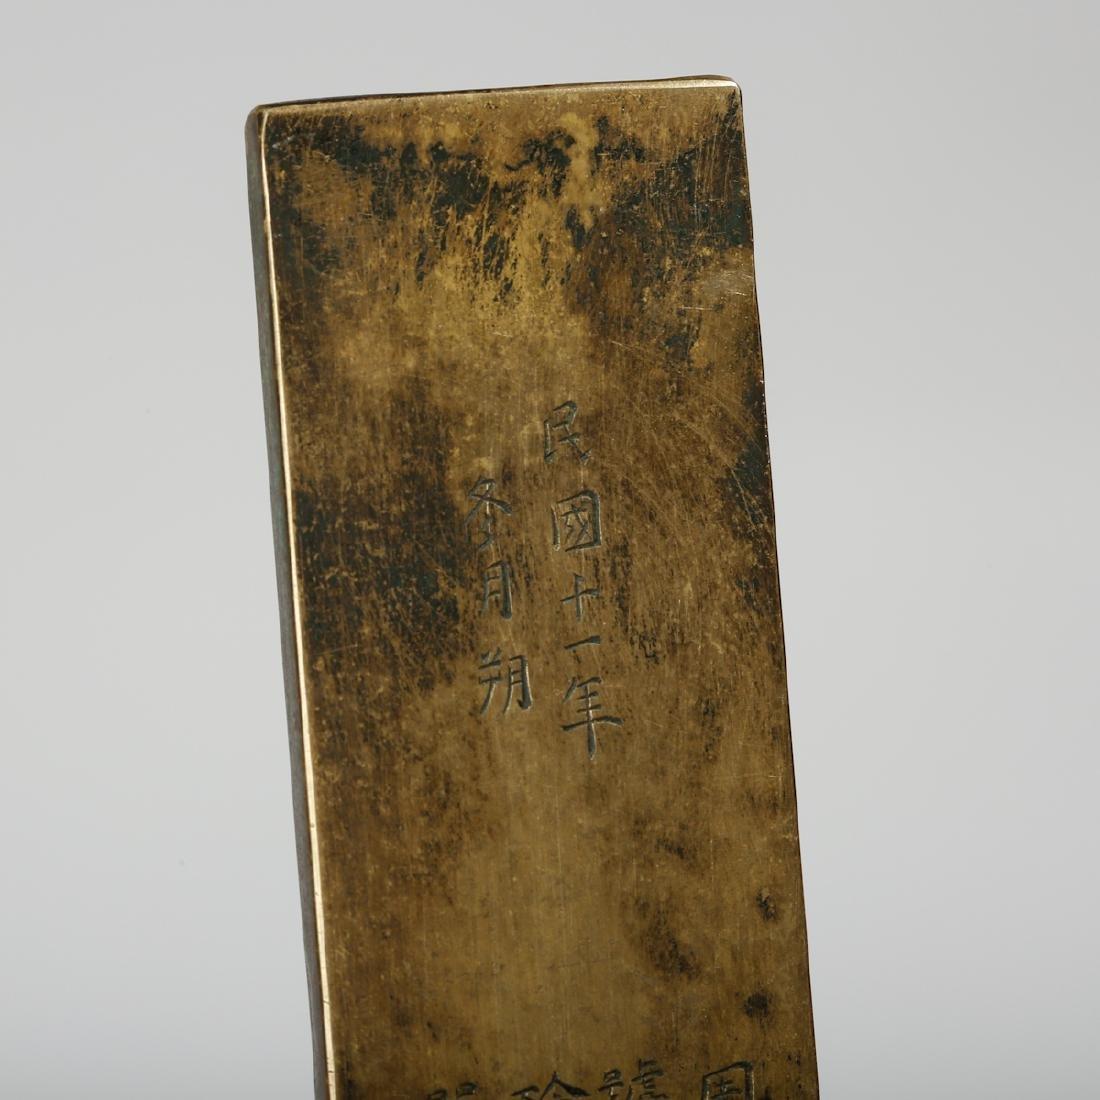 CHINESE BRONZE SCHOLAR PAPER WEIGHT - 3